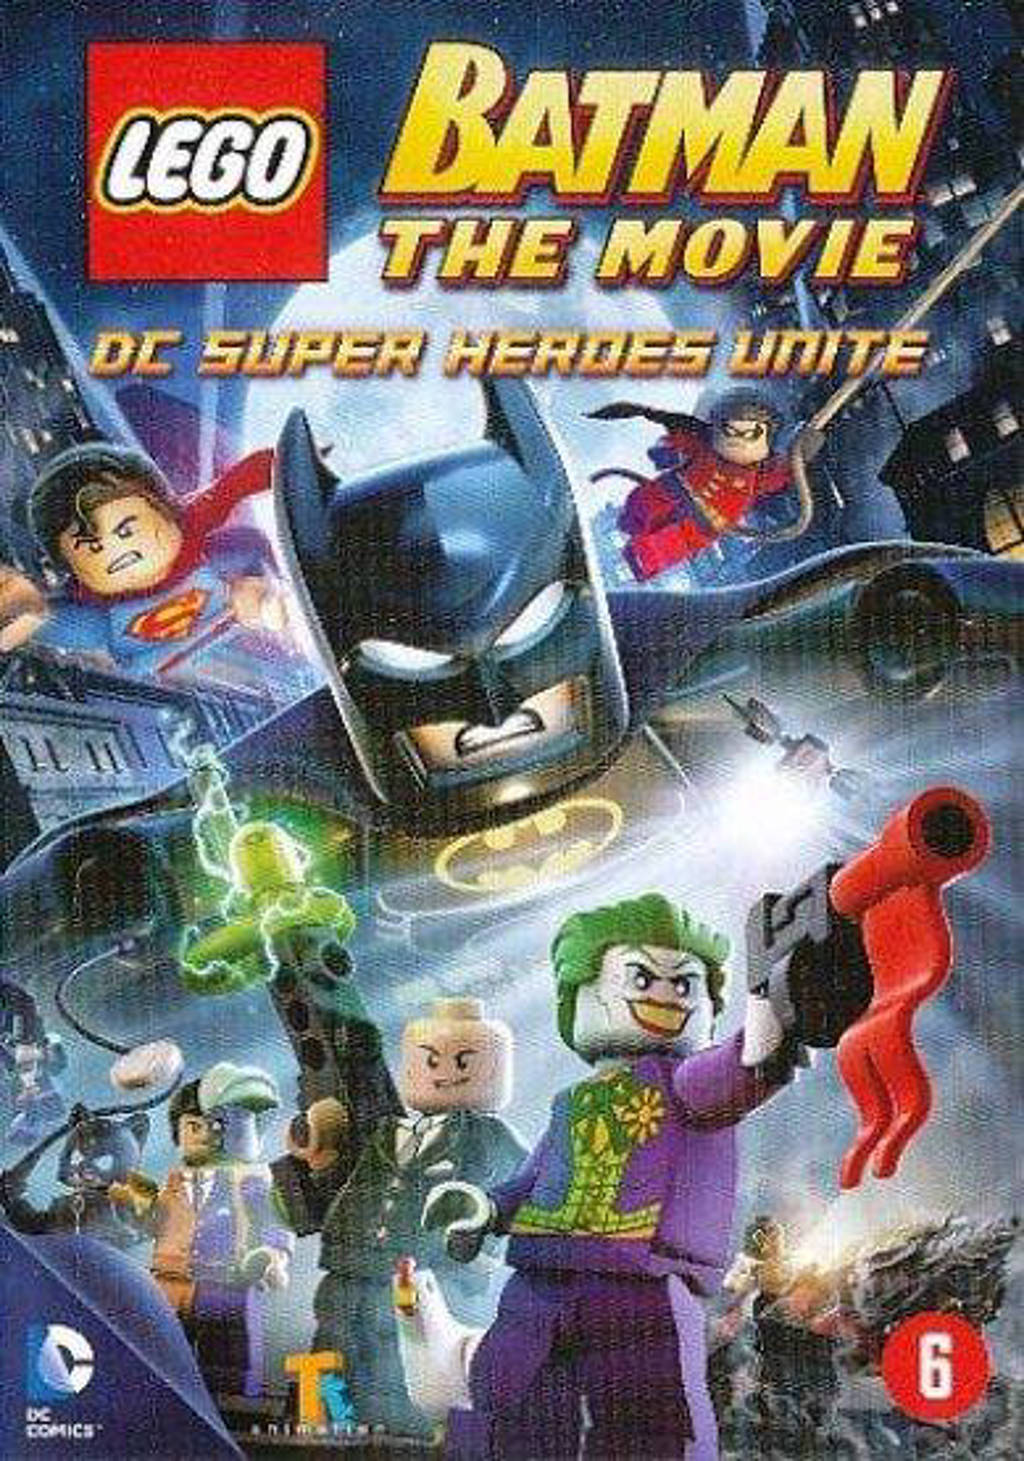 Lego Batman - The movie DC super heroes unite (DVD)